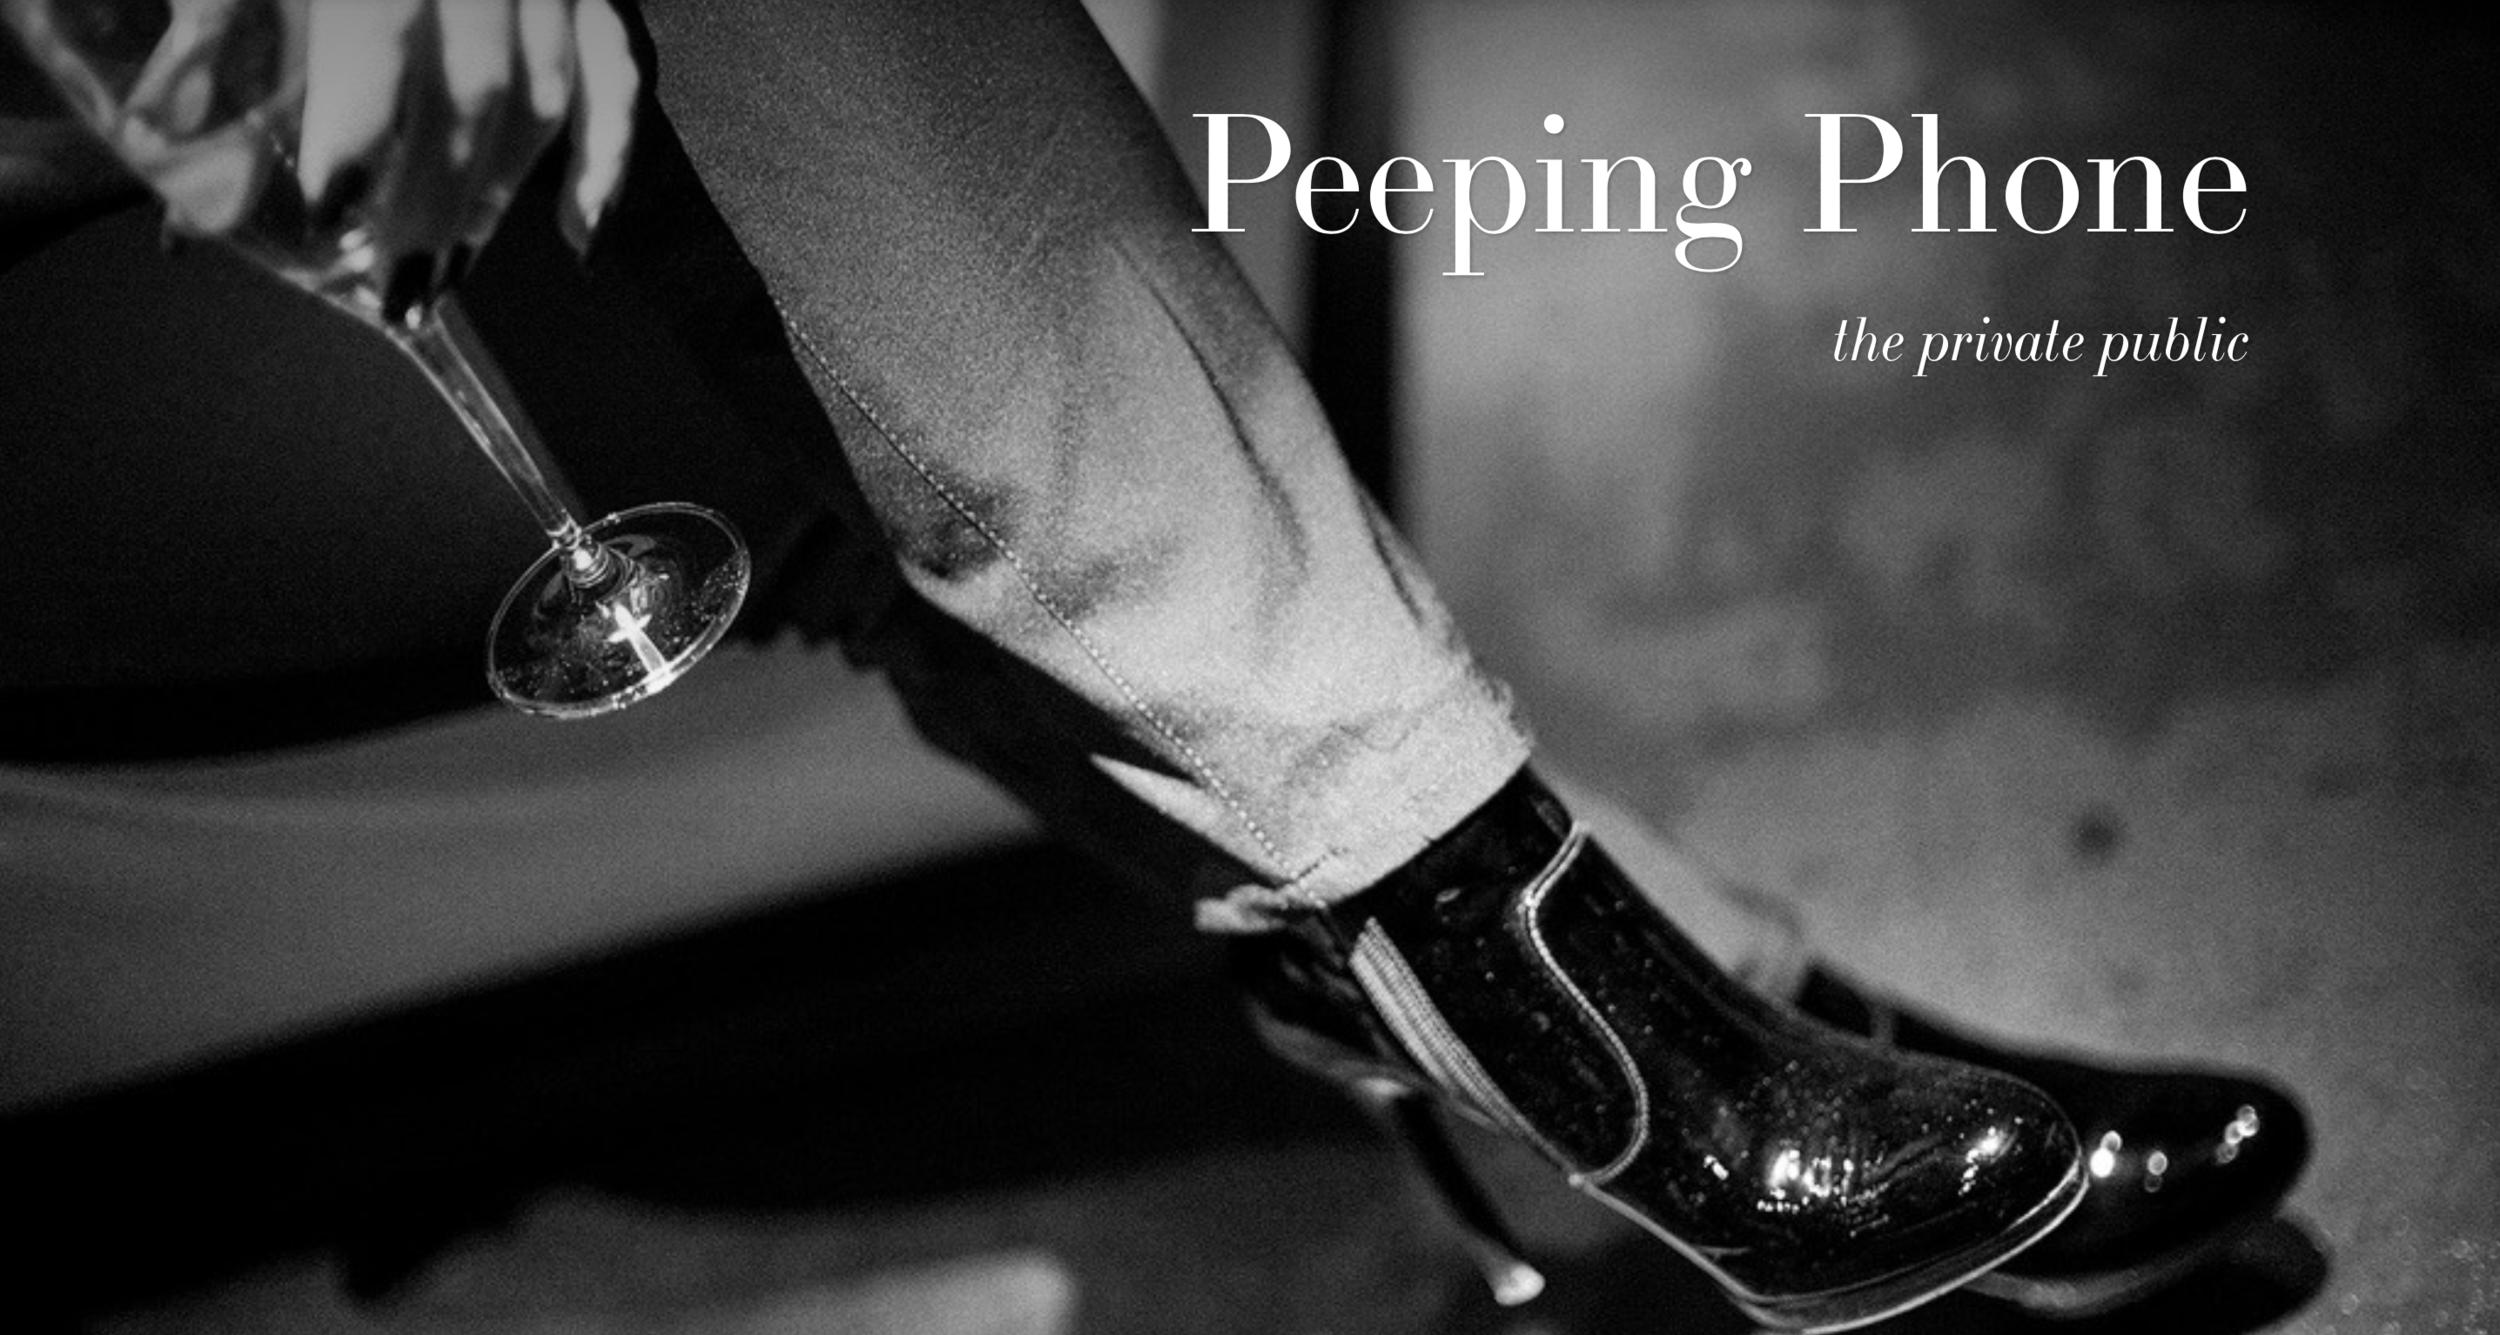 PEEPING PHONE - by Eric Berger